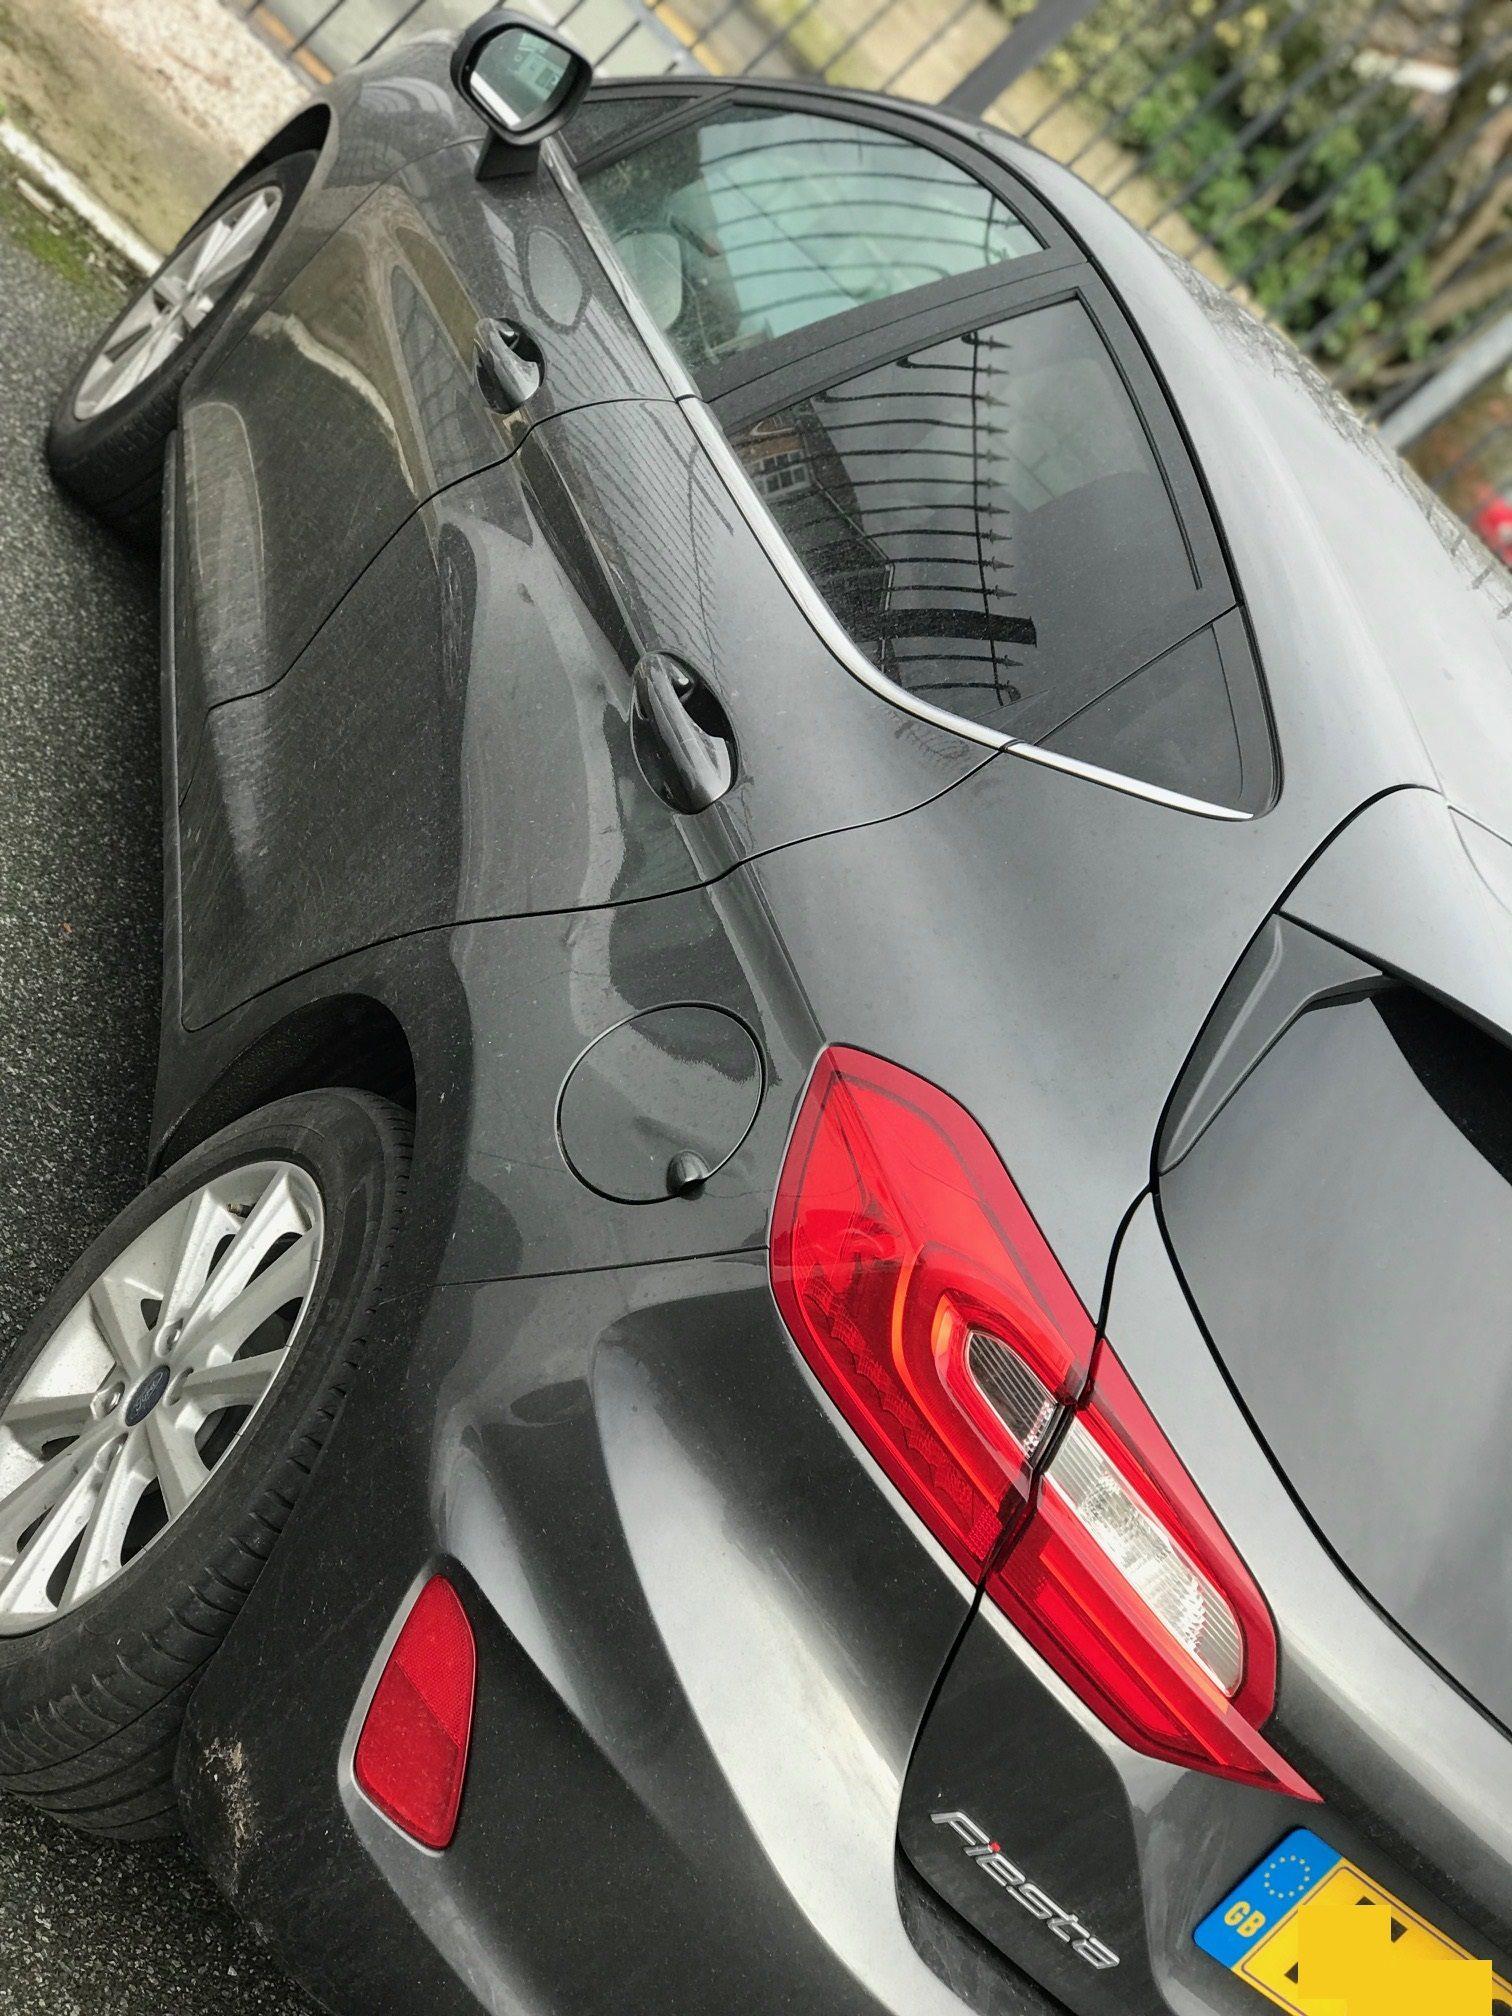 Ford FIESTA HATCHBACK 1.0 EcoBoost Titanium 5dr Car Leasing Information